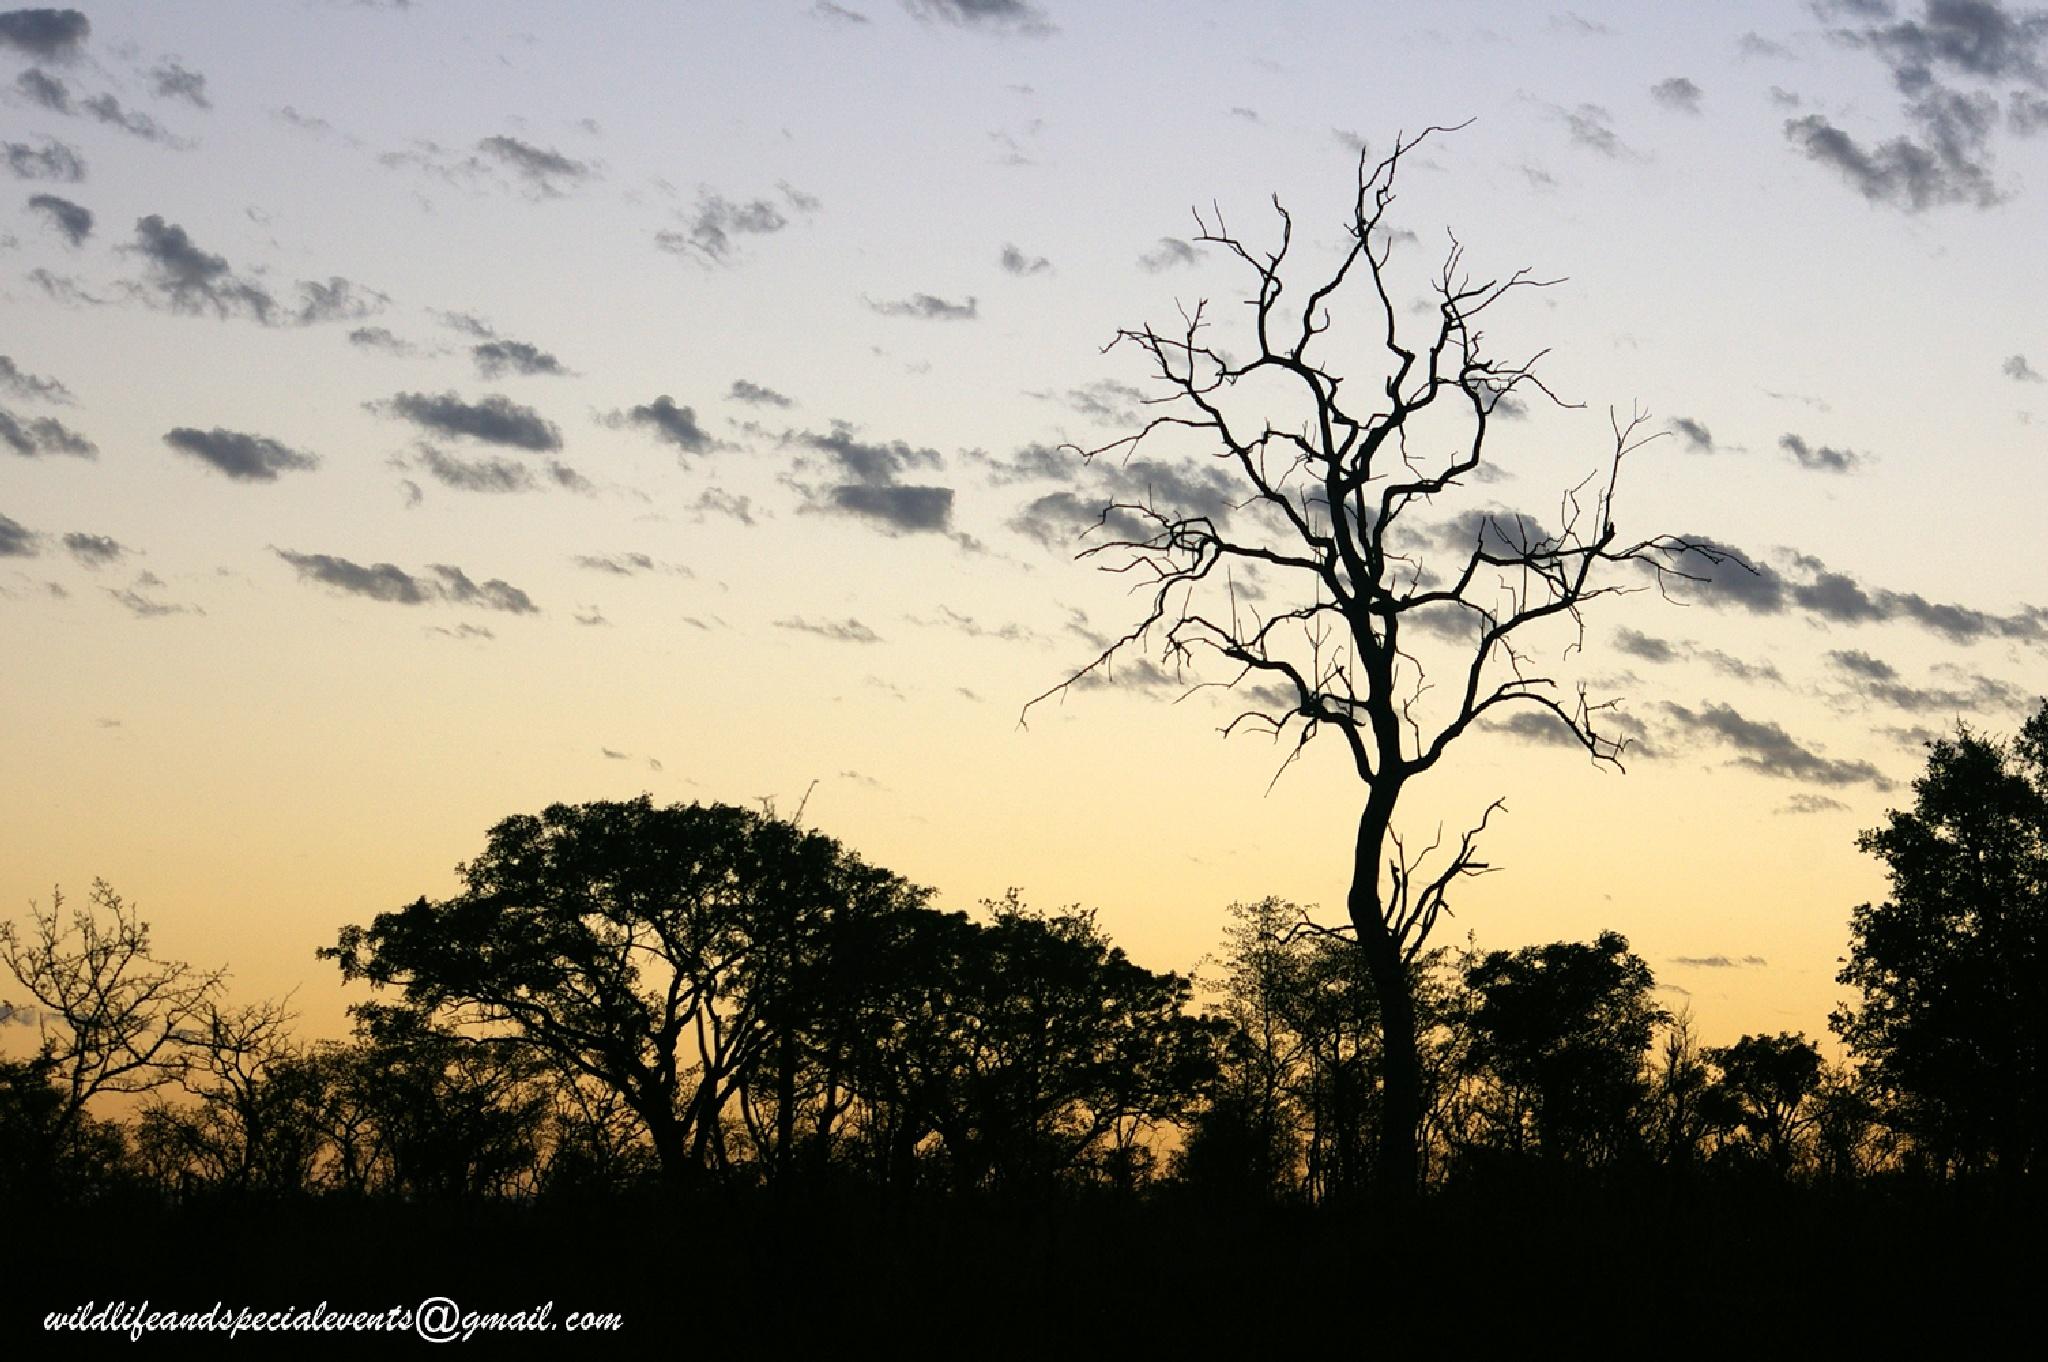 A Bushveld Sunrise in Africa by oosie